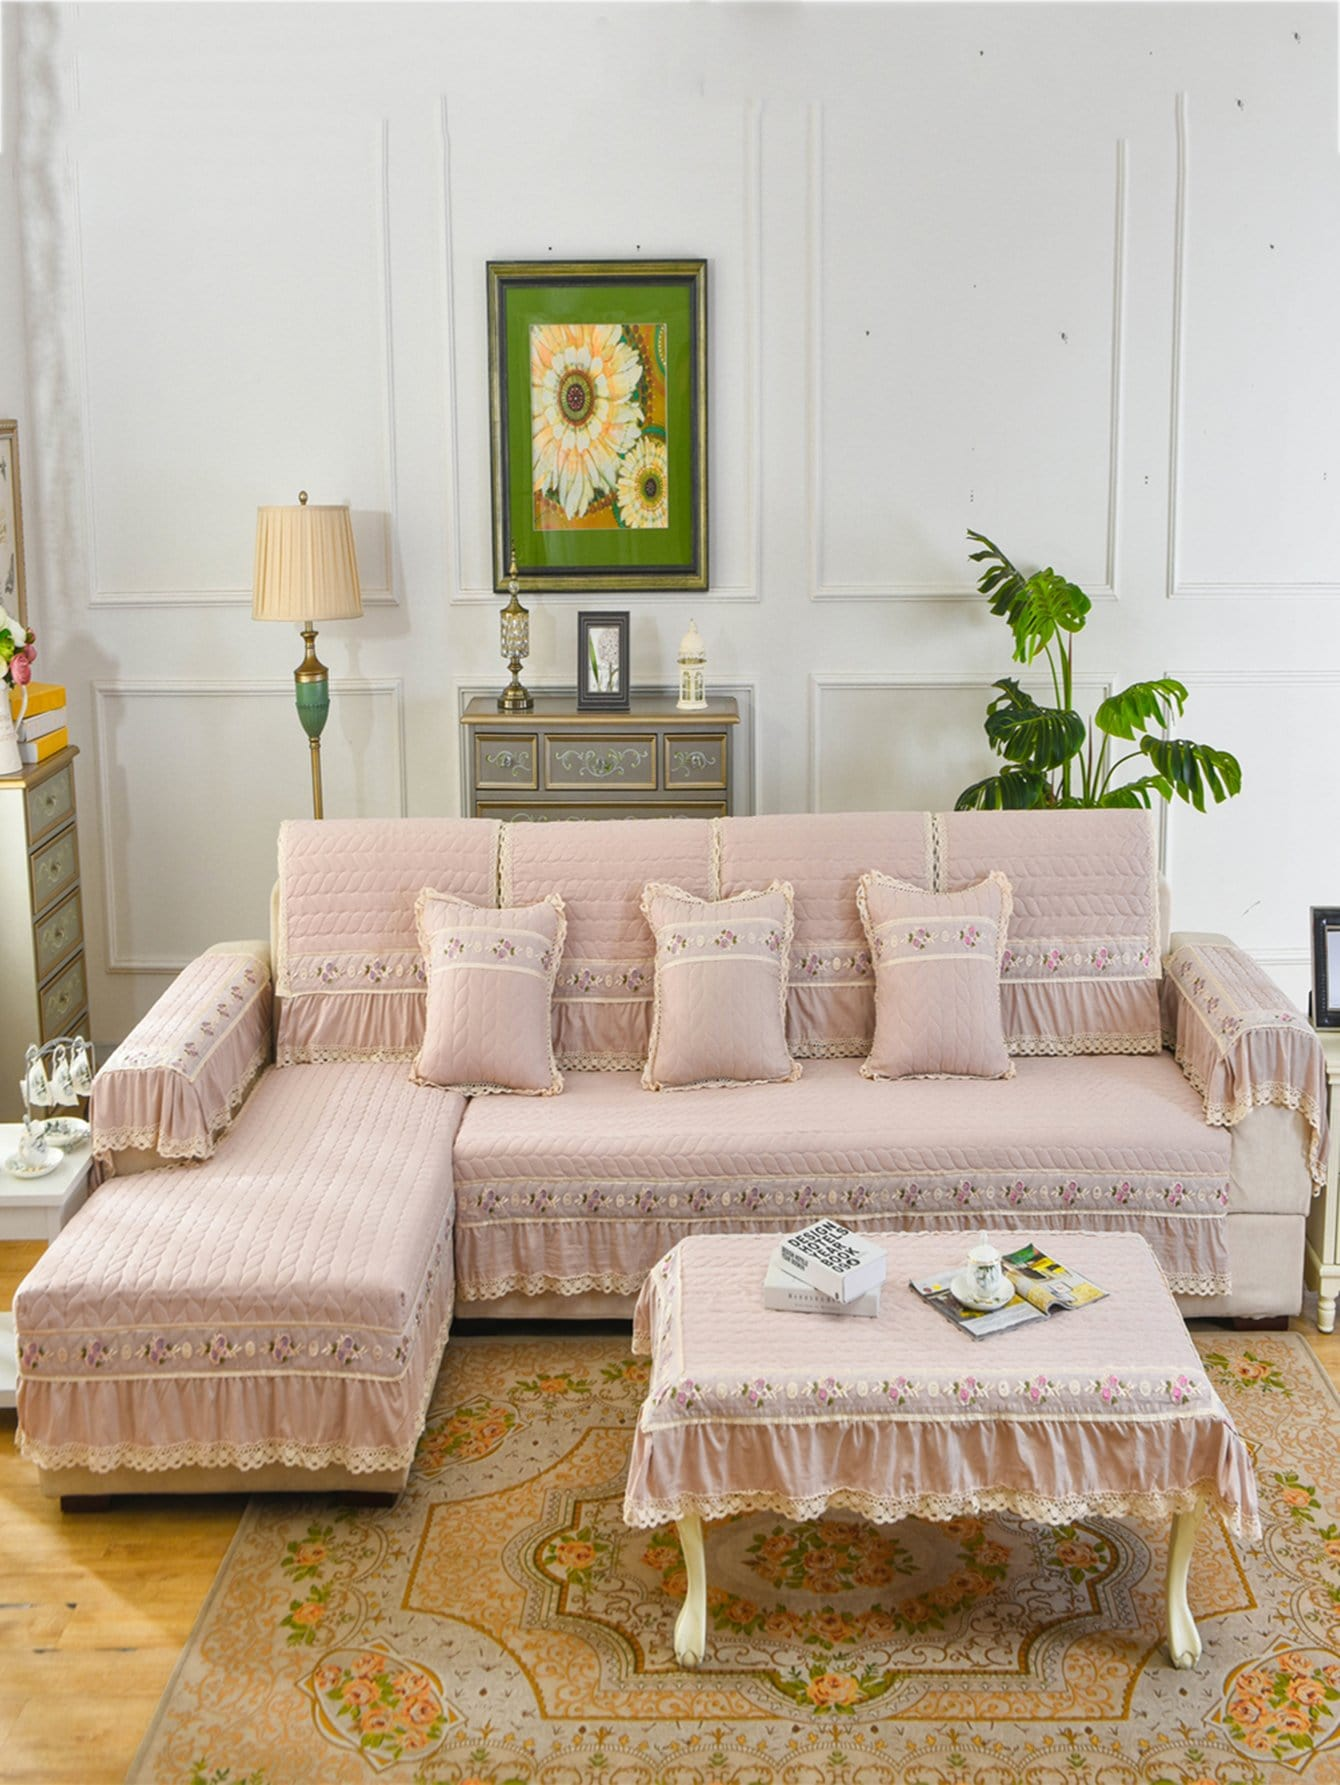 Купить Чехол для дивана с кружевами 1 шт, null, SheIn